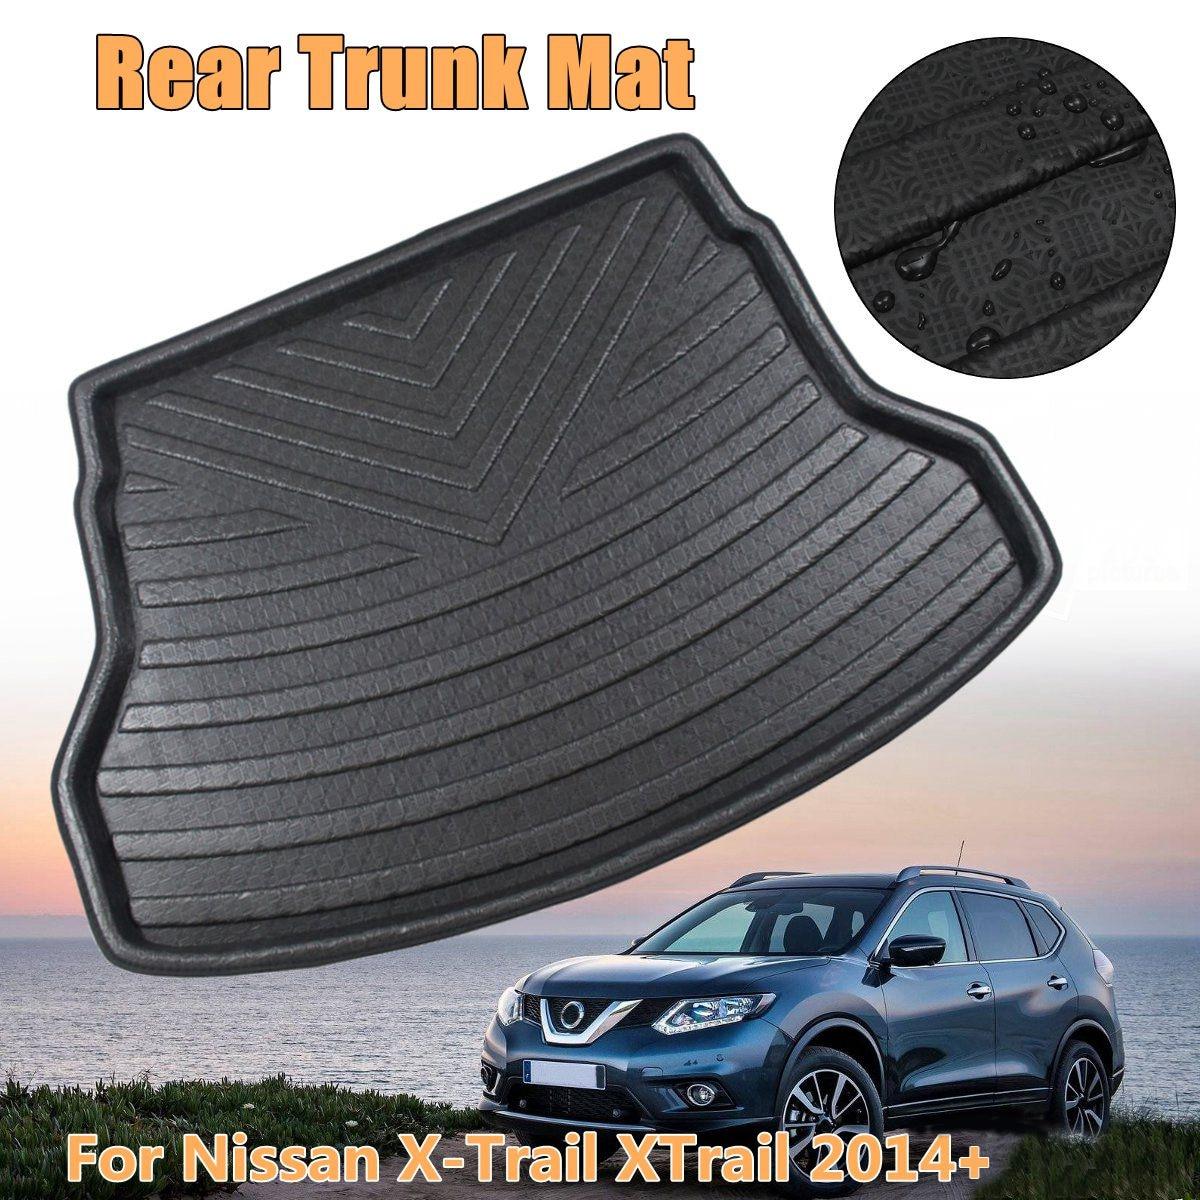 Araba Boot kargo astar Nissan x trail XTrail 2014 2015 2016 2017 2018 2019 + arka bagaj zemin mat tepsi halı çamur koruyucu 1 adet title=